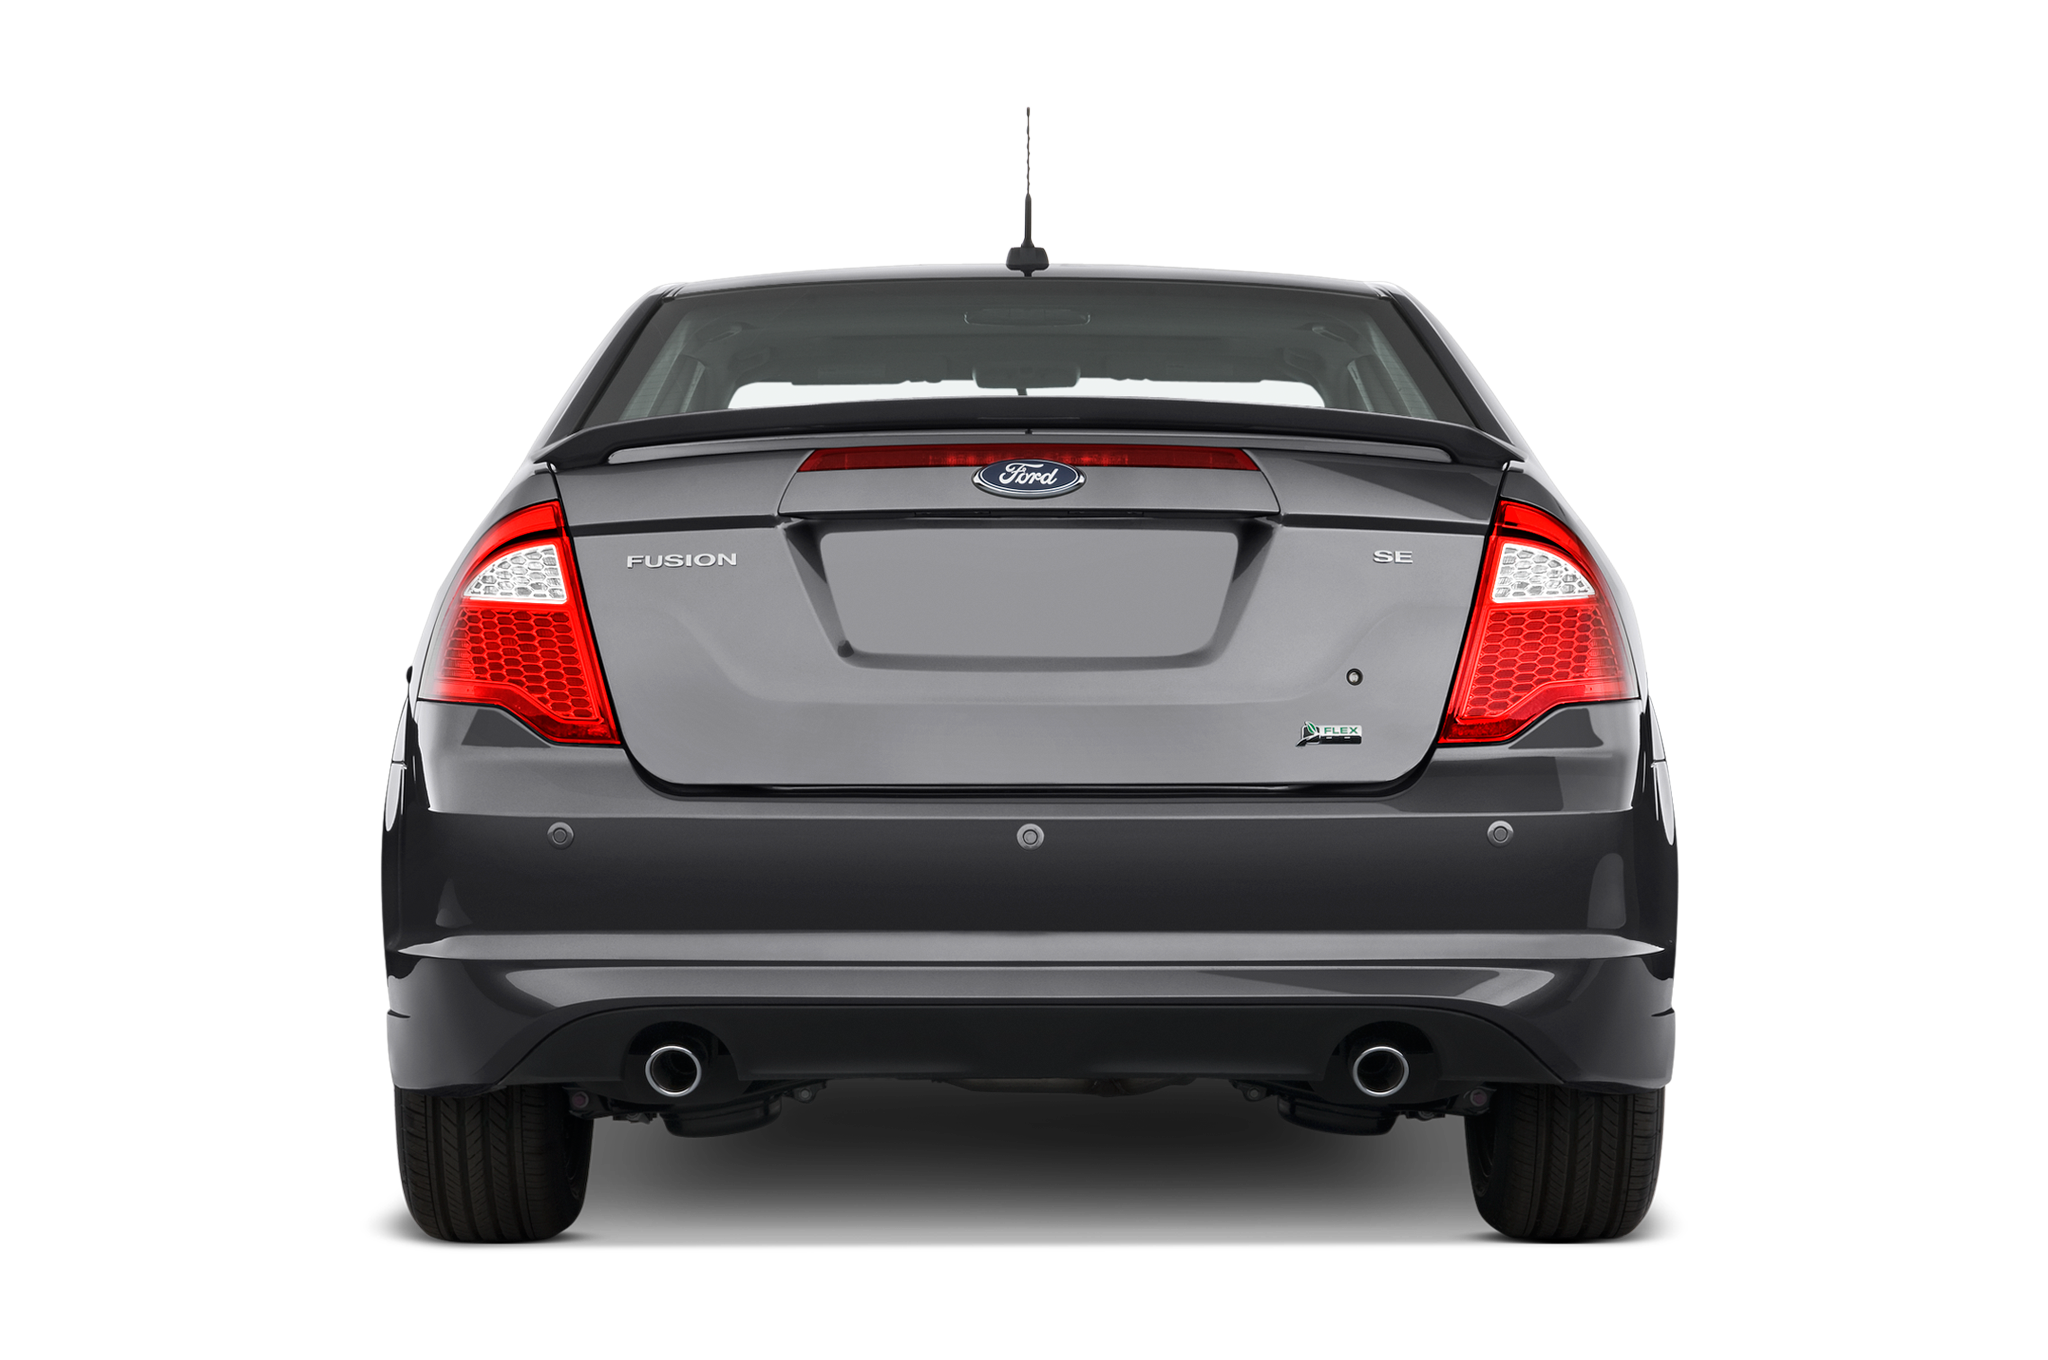 Ford Fusion (North America) I 2005 - 2012 Sedan #2